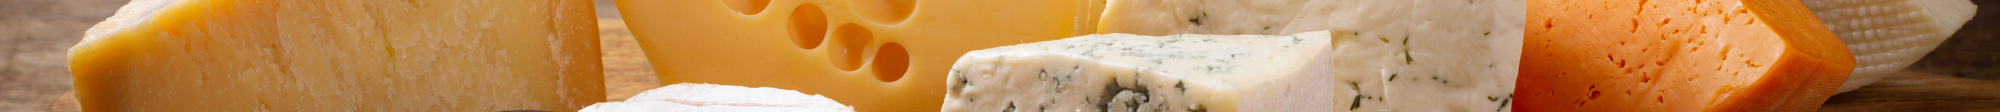 Comprar  quesos Inglaterra gourmet online   Mixtura Gourmet